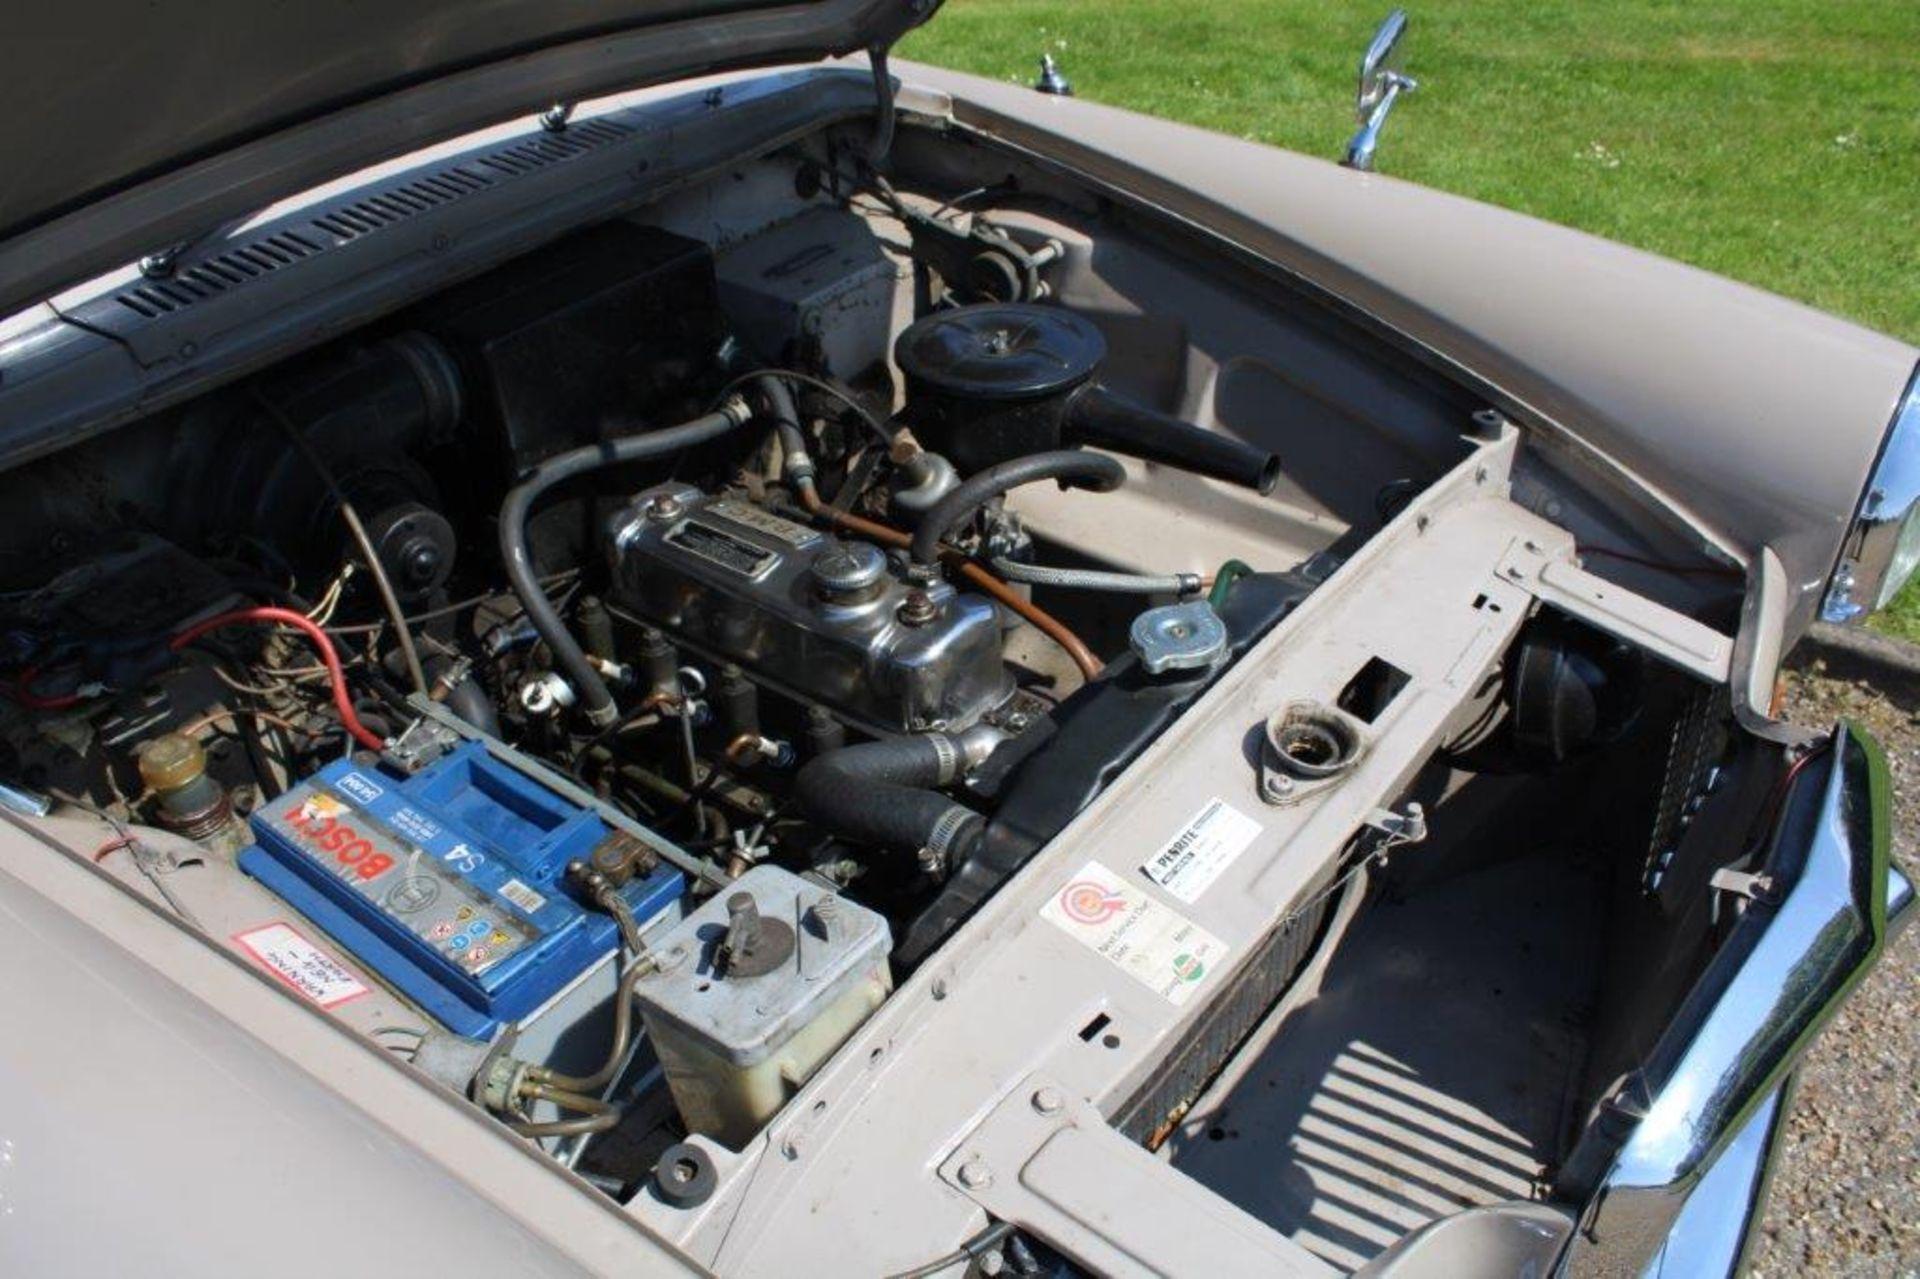 1969 Wolseley 16/60 Auto - Image 26 of 31